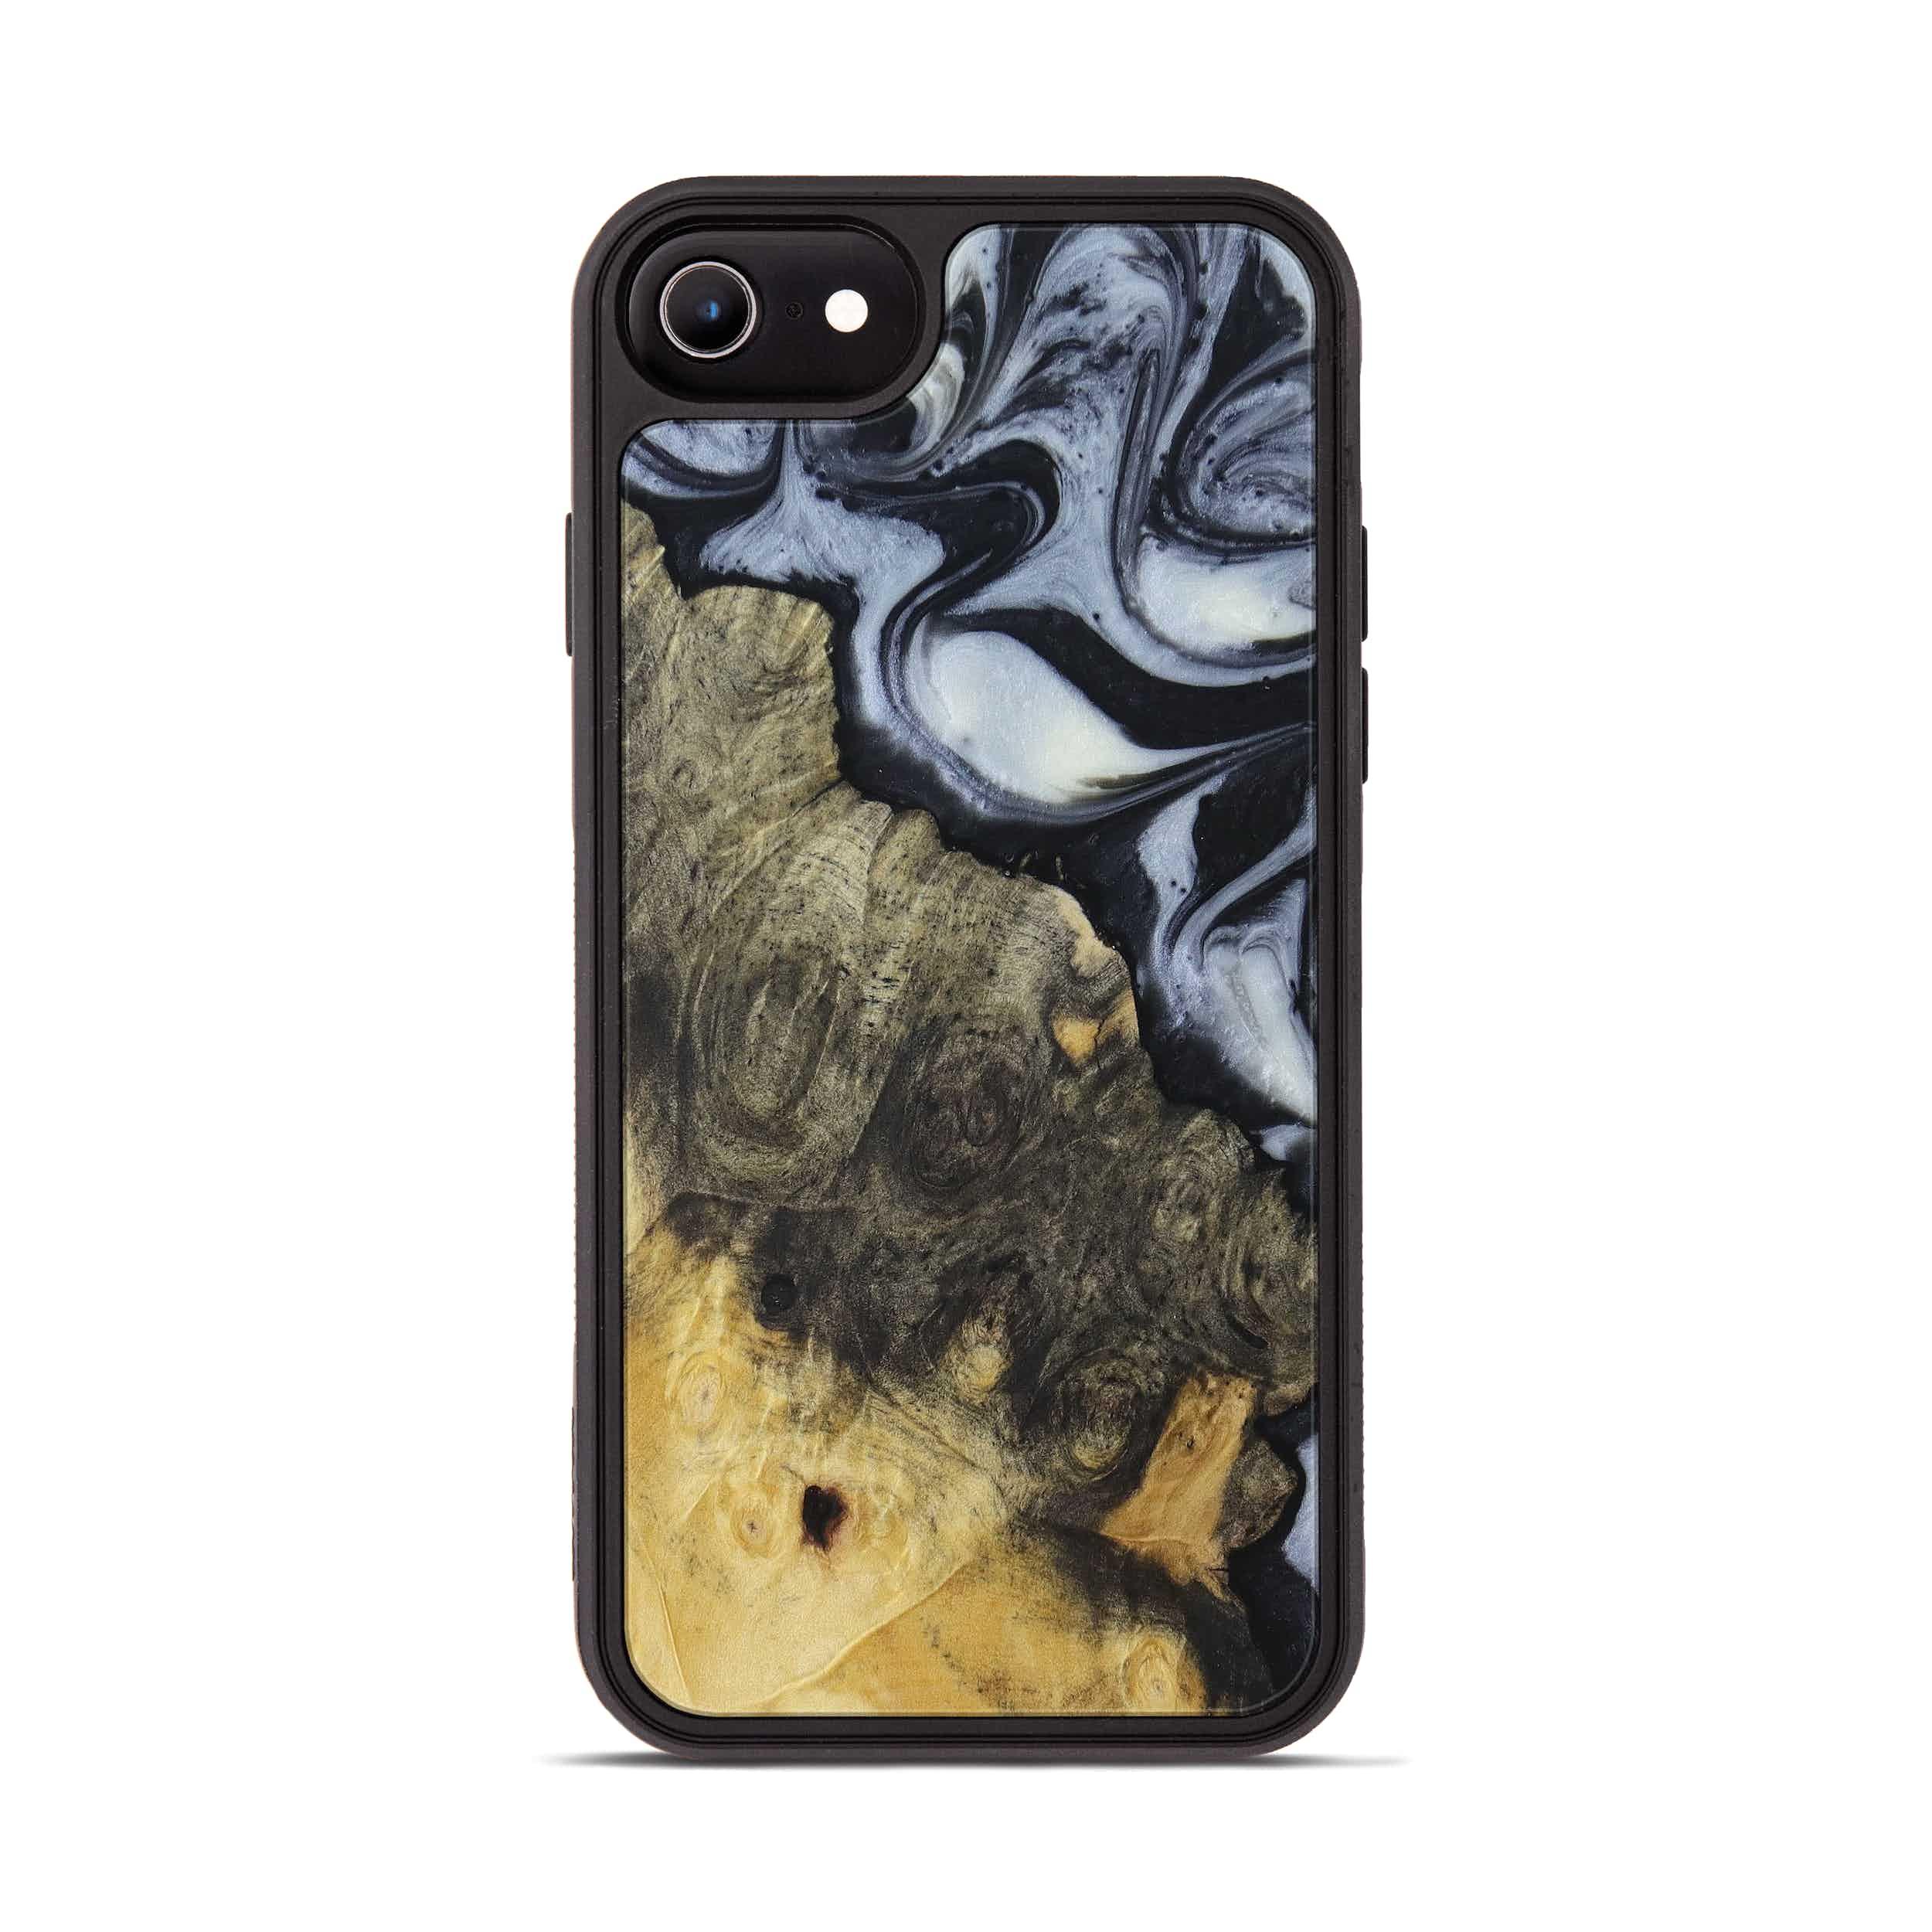 iPhone 6s Wood+Resin Phone Case - Esam (Black & White, 397913)